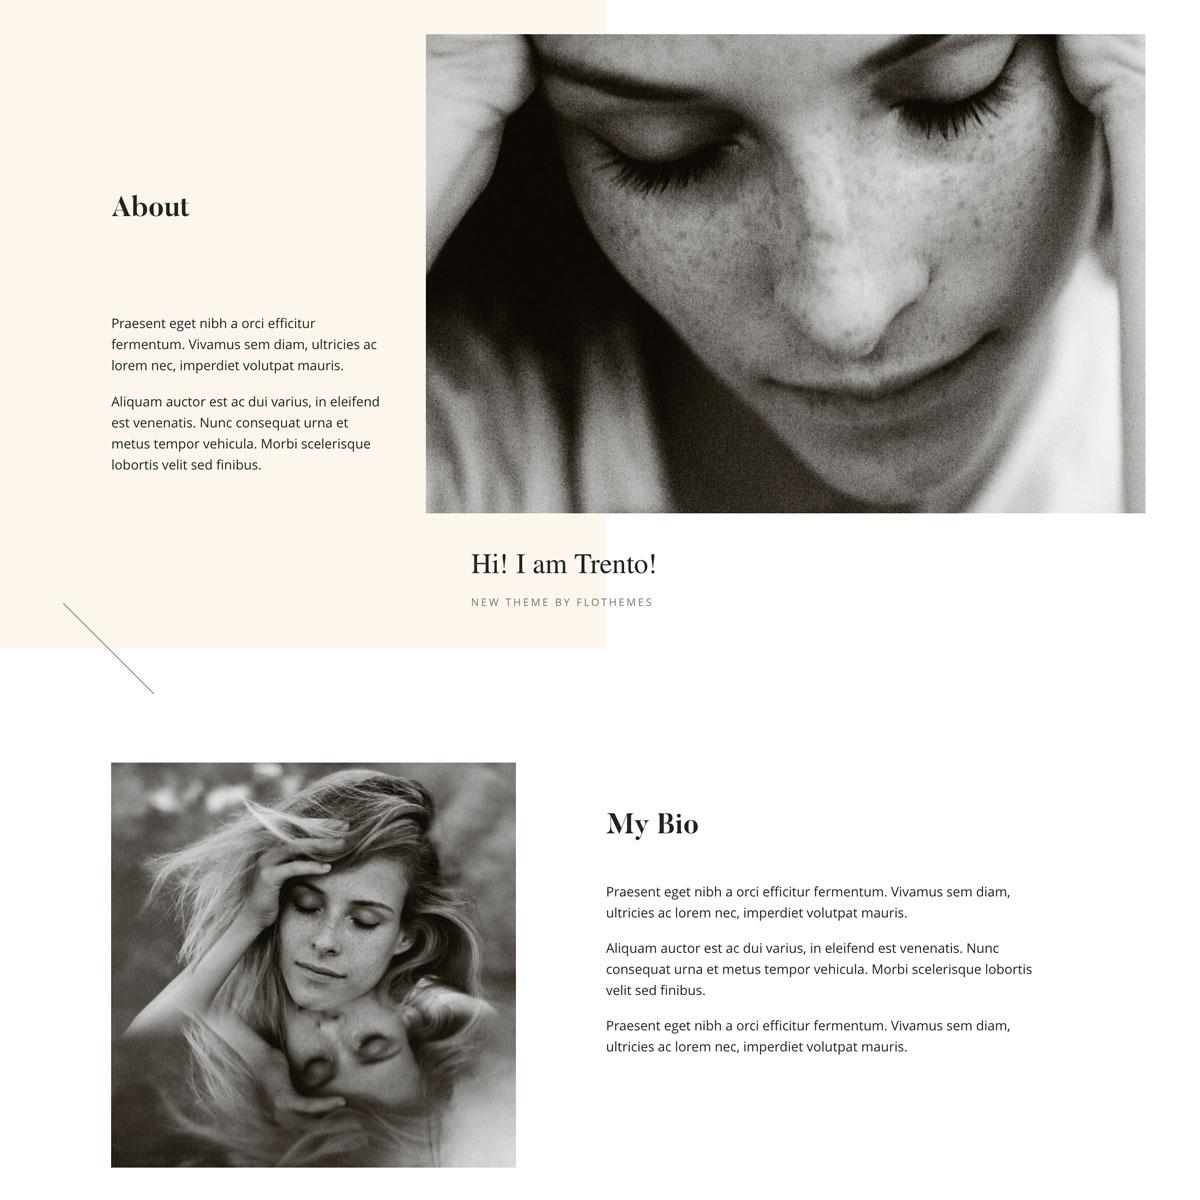 Trento theme design, switch from Squarespace to WordPress, Flothemes, Ben Sasso photography